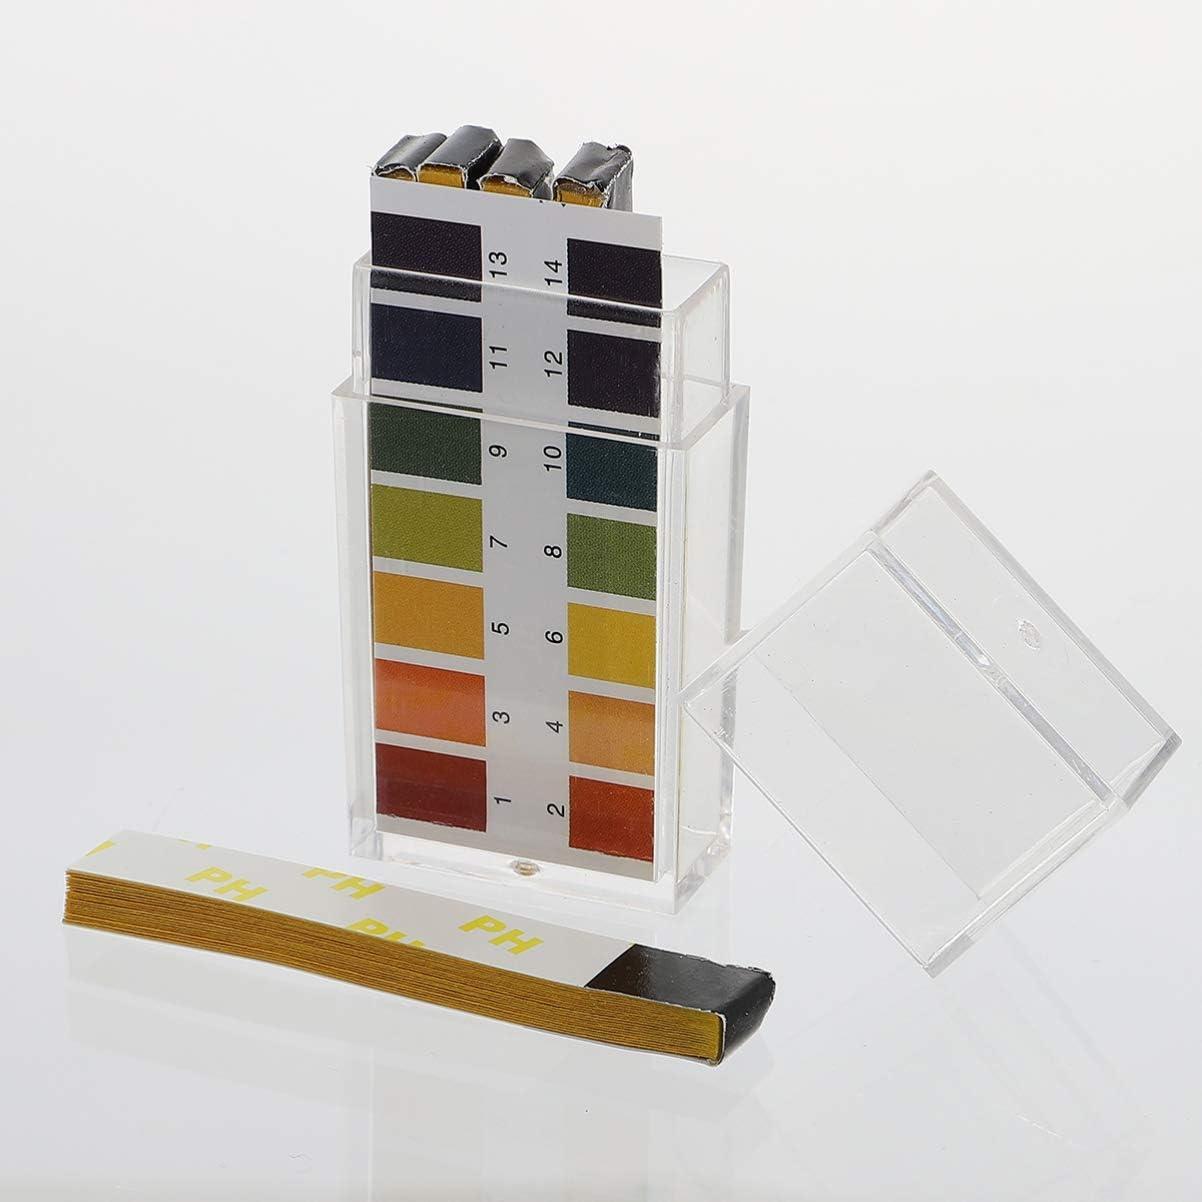 1-14 Testpapier Ph-Indikator Papierstreifentester ULTECHNOVO 200Pcs Ph Teststreifen Ph